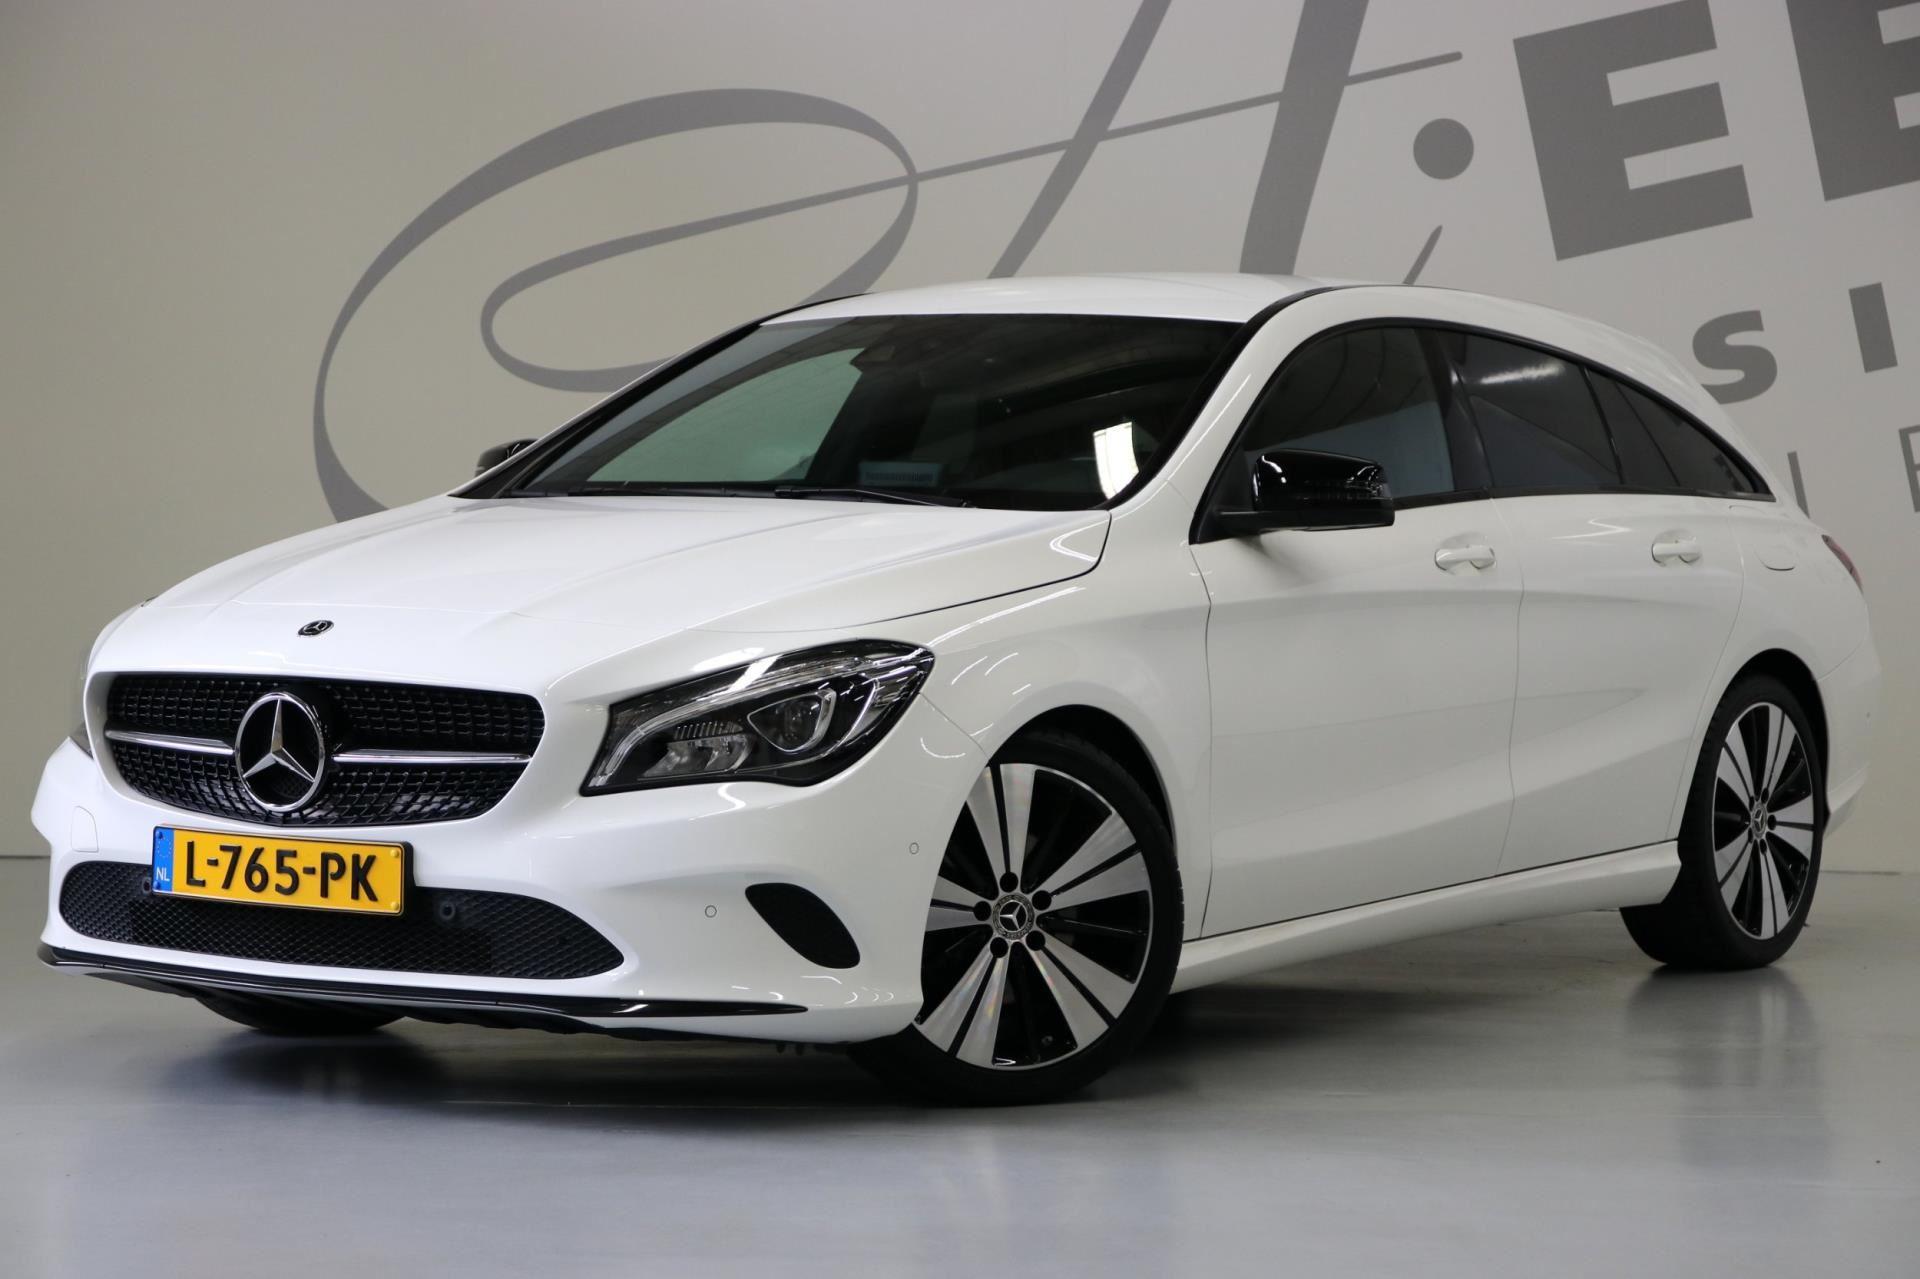 Mercedes-Benz CLA Shooting Brake occasion - Aeen Exclusieve Automobielen